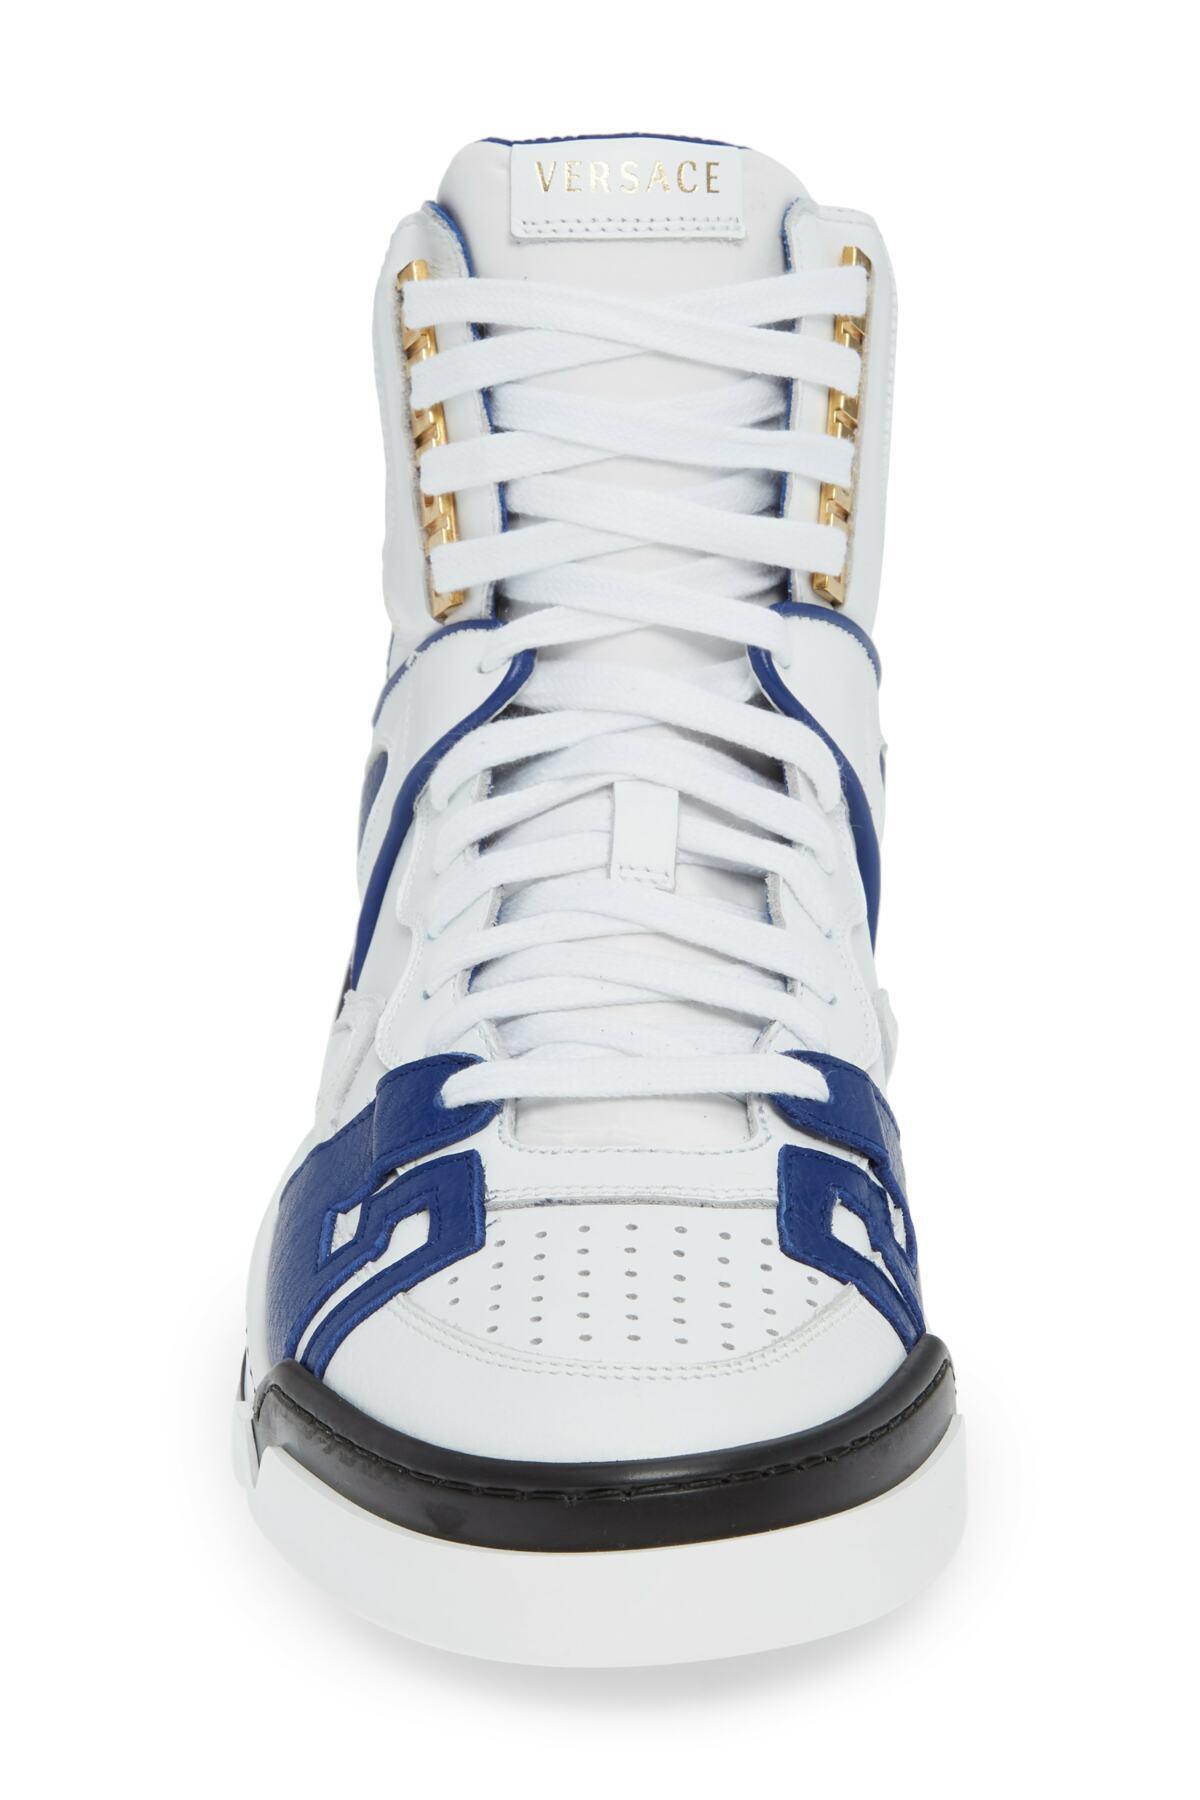 Versace Atlas High Top Sneaker in Blue